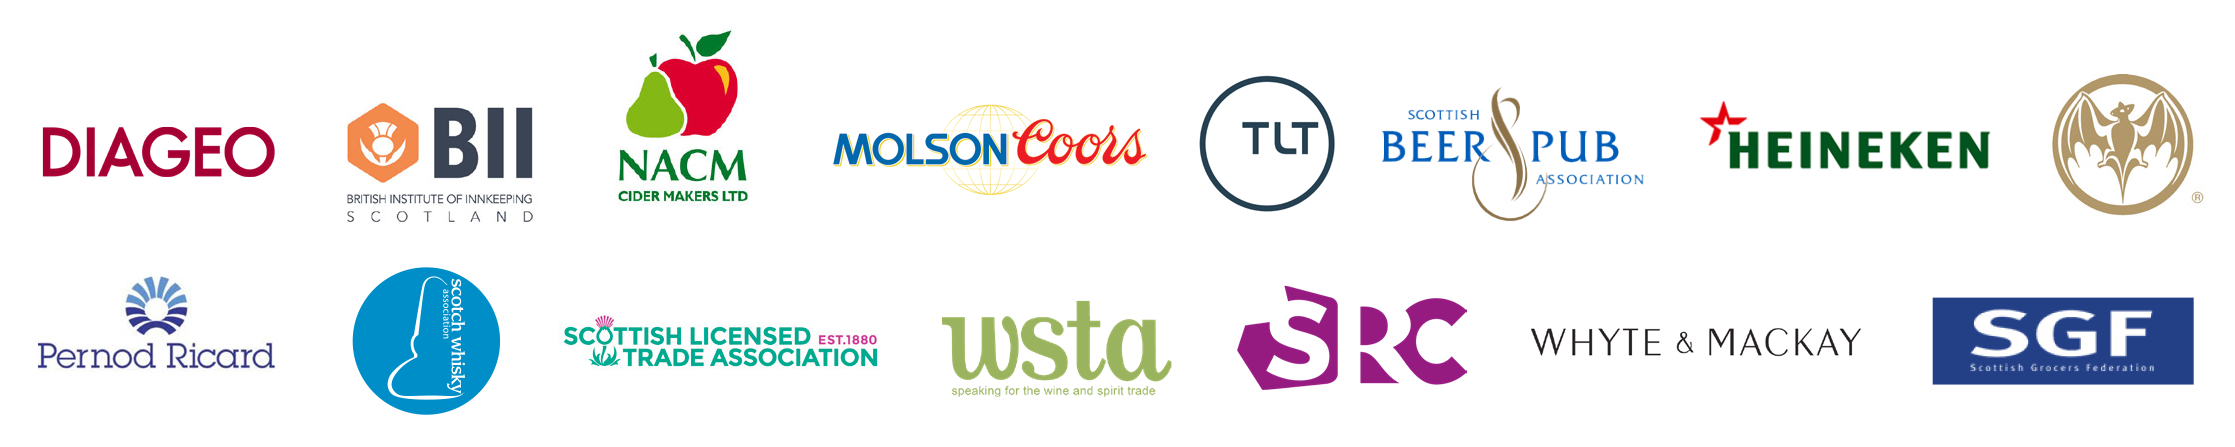 Partner Logos Horizontal.png